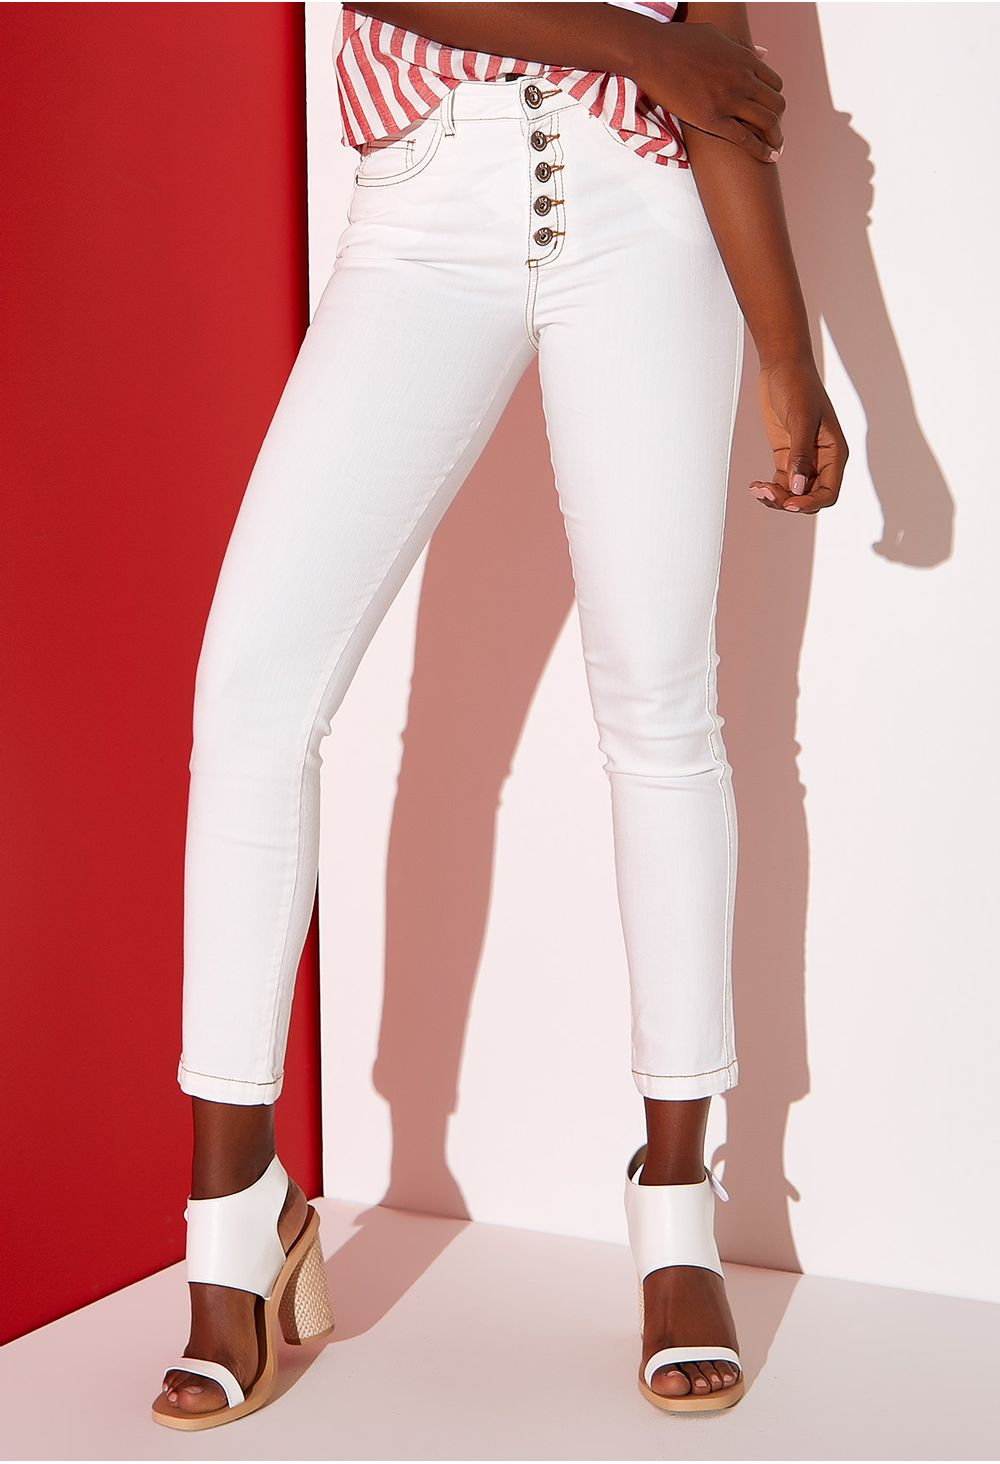 acaacf09d96 Jeans Skinny Con Botones Expuestos Natural E135965 - ELA